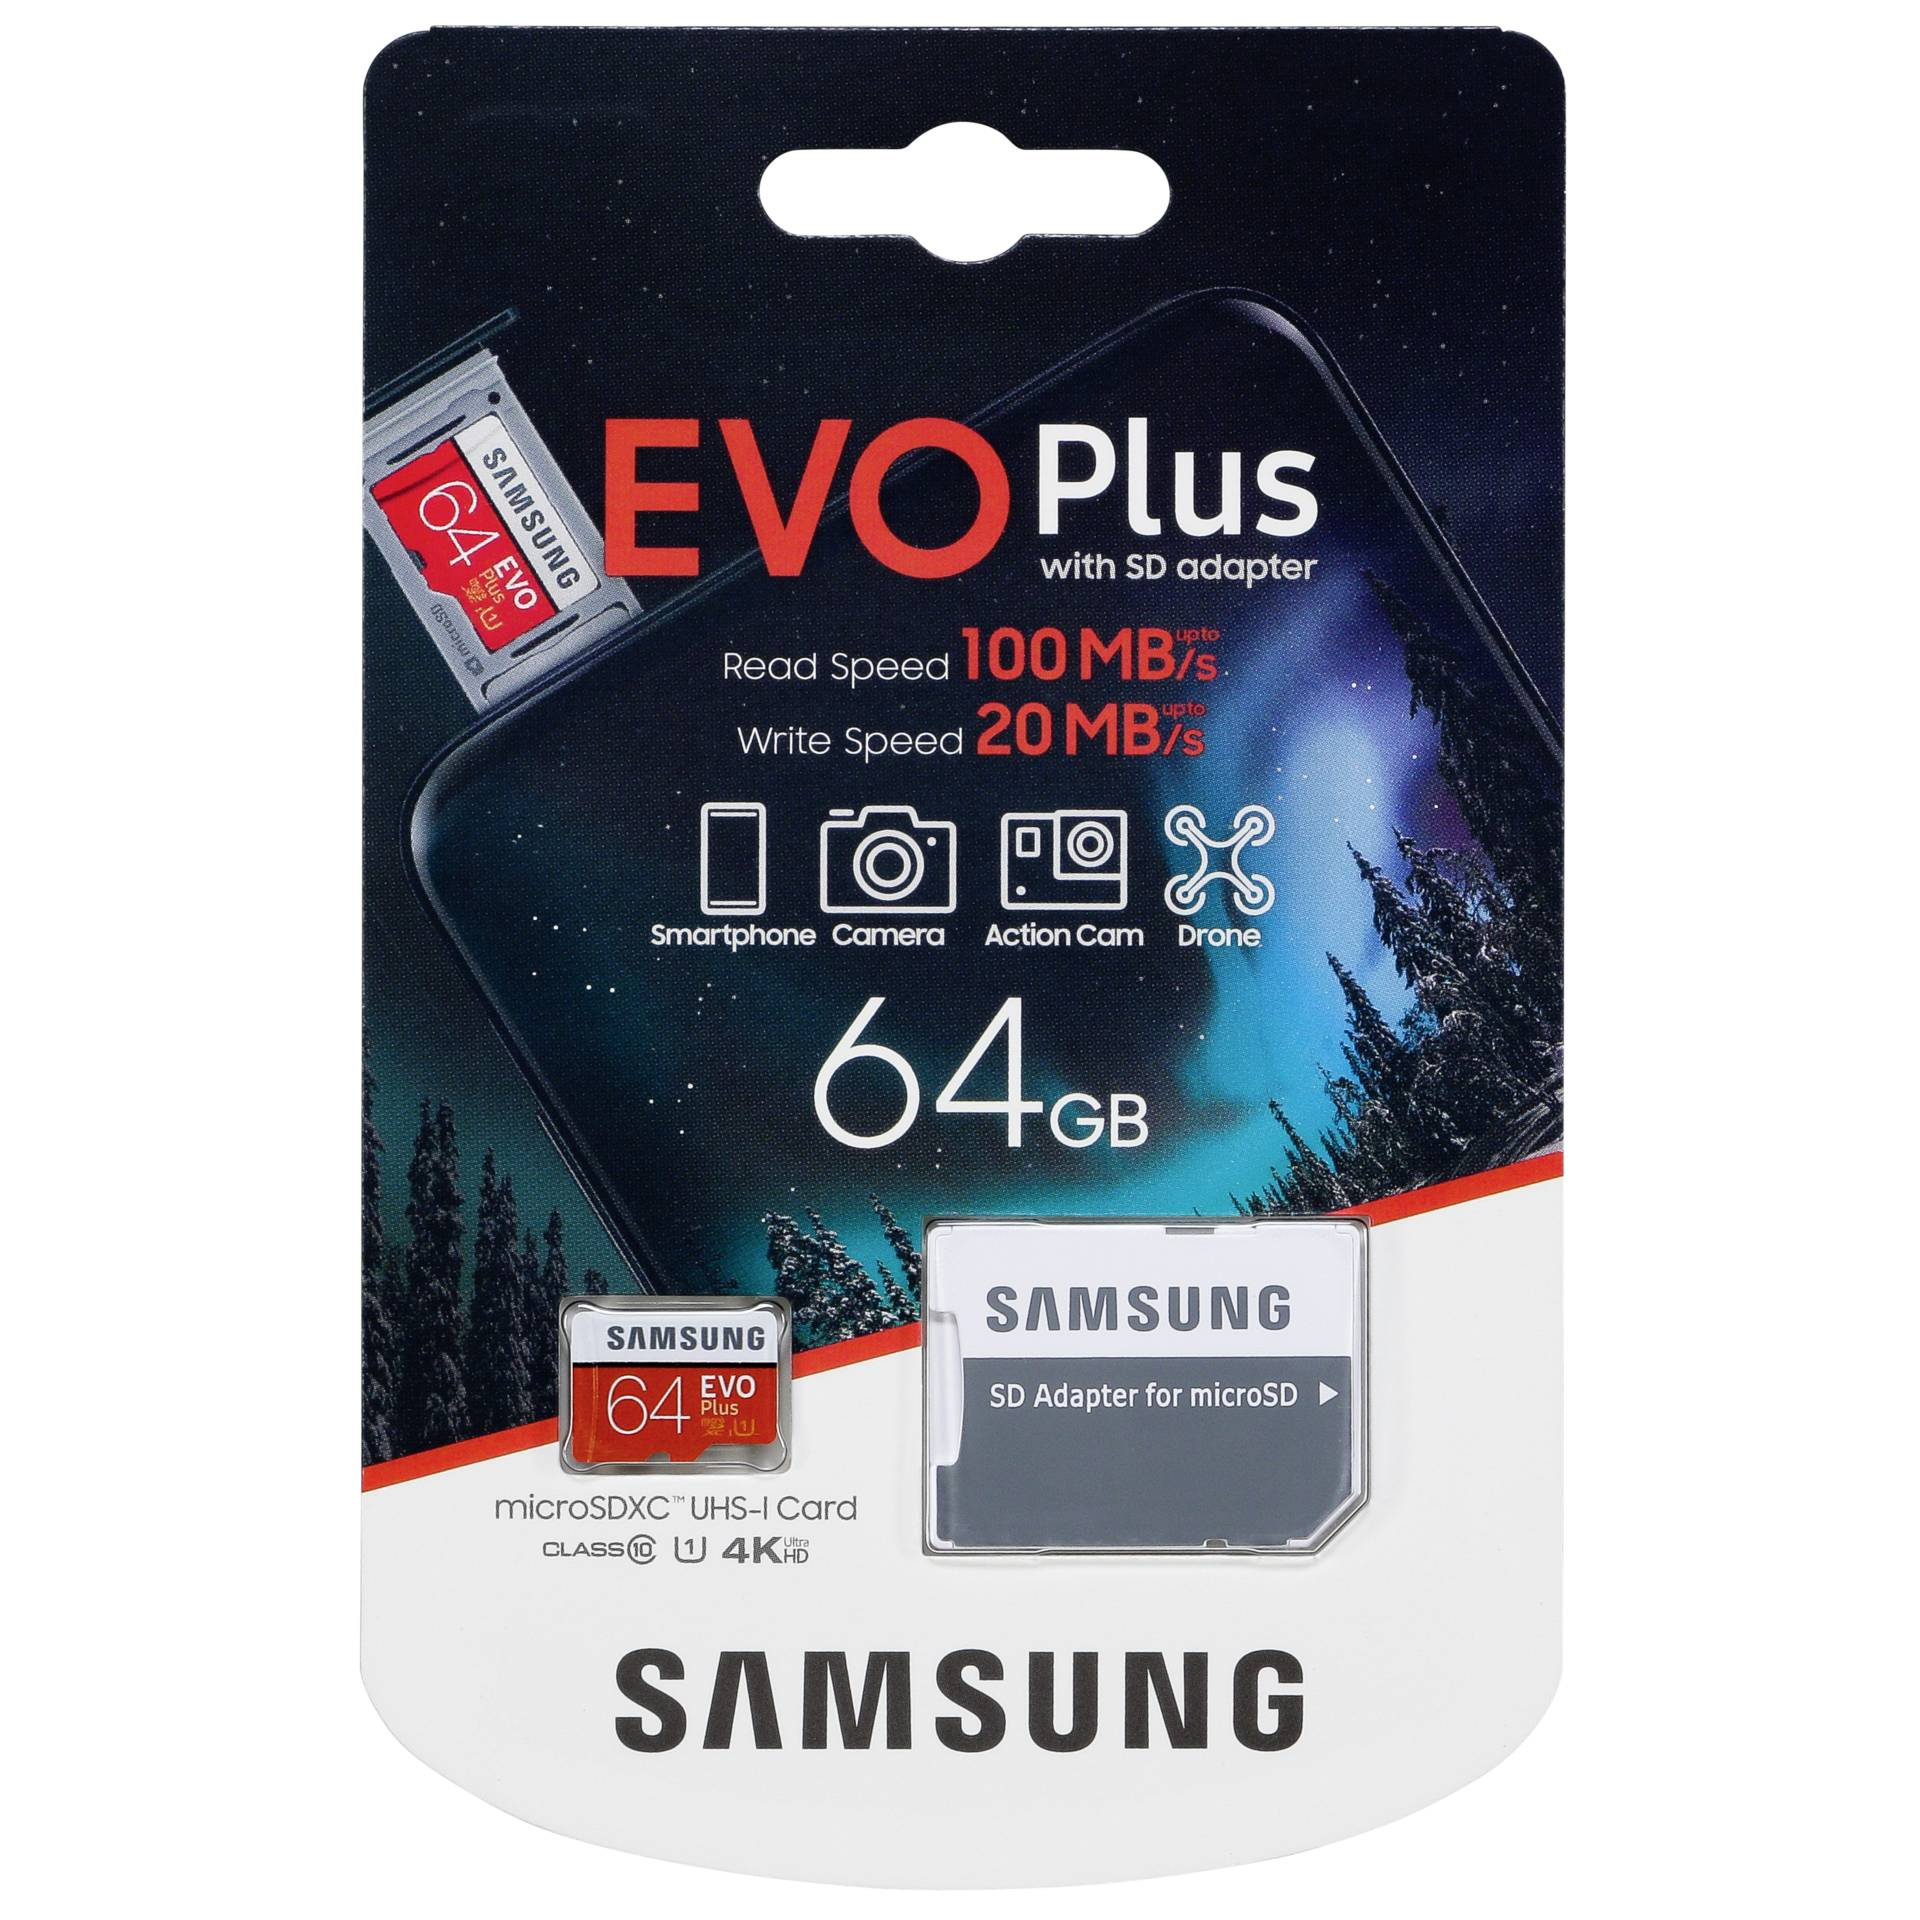 Samsung microSDXC EVO Plus 64GB with adapter UHS-I